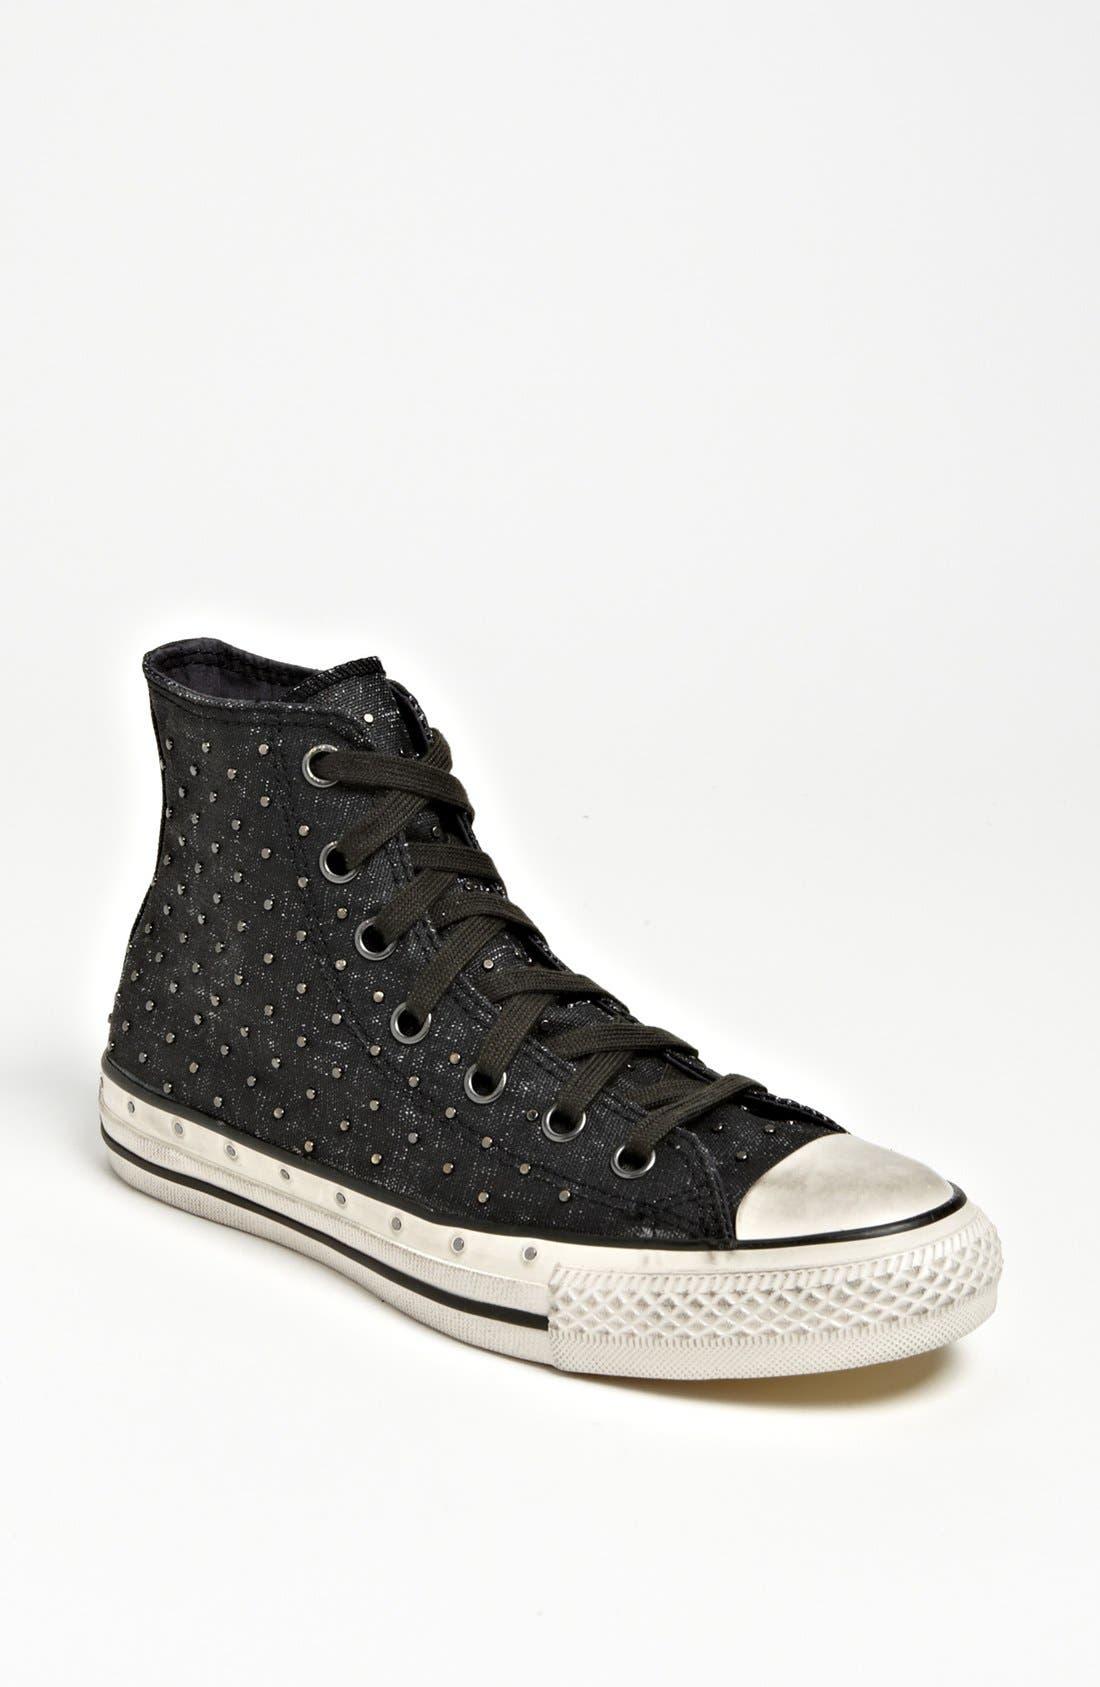 Alternate Image 1 Selected - Converse by John Varvatos 'All Star® Hi Studded' Sneaker (Women)